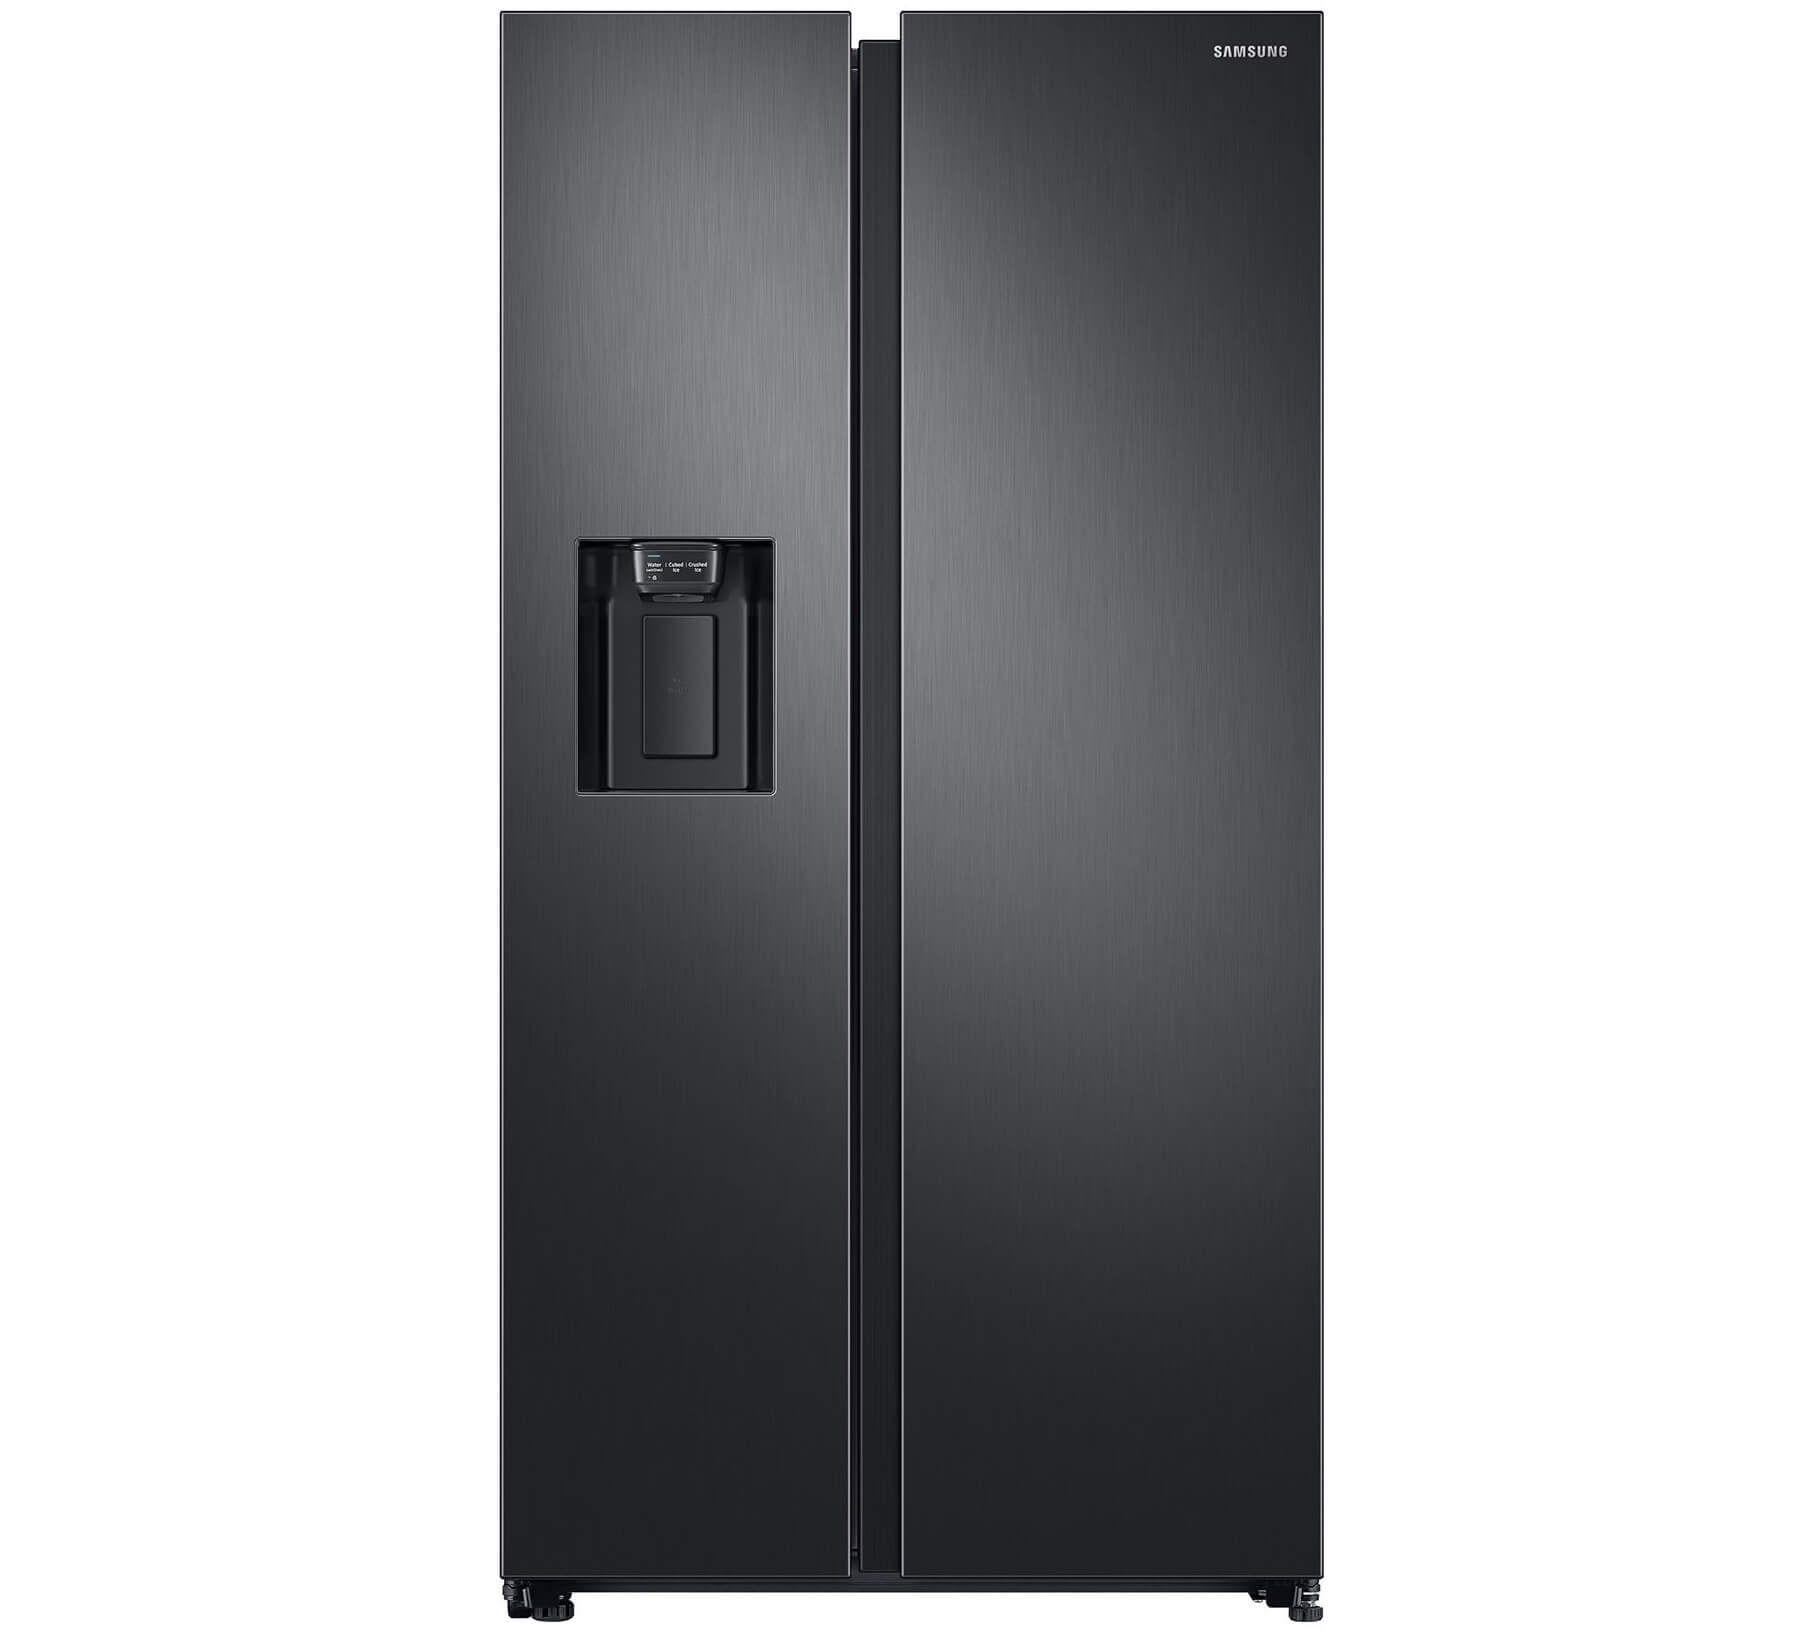 Samsung Rs68n8220b1 Ef American Fridge Freezers American Style